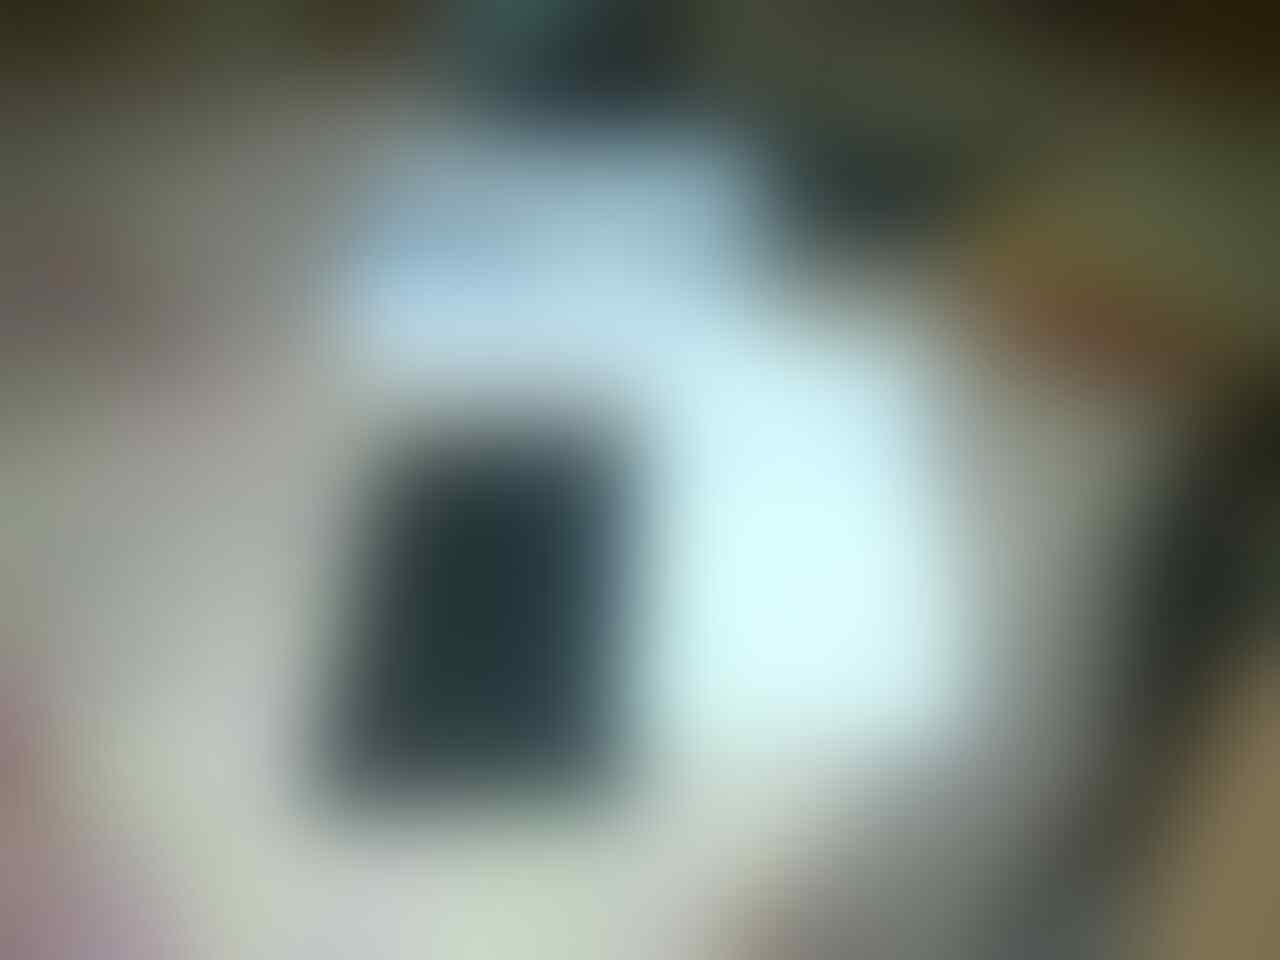 Jual Samsung Galaxy Tab 2 P3100 7.0 1 Bulan Pake Murah Mulus Bandung